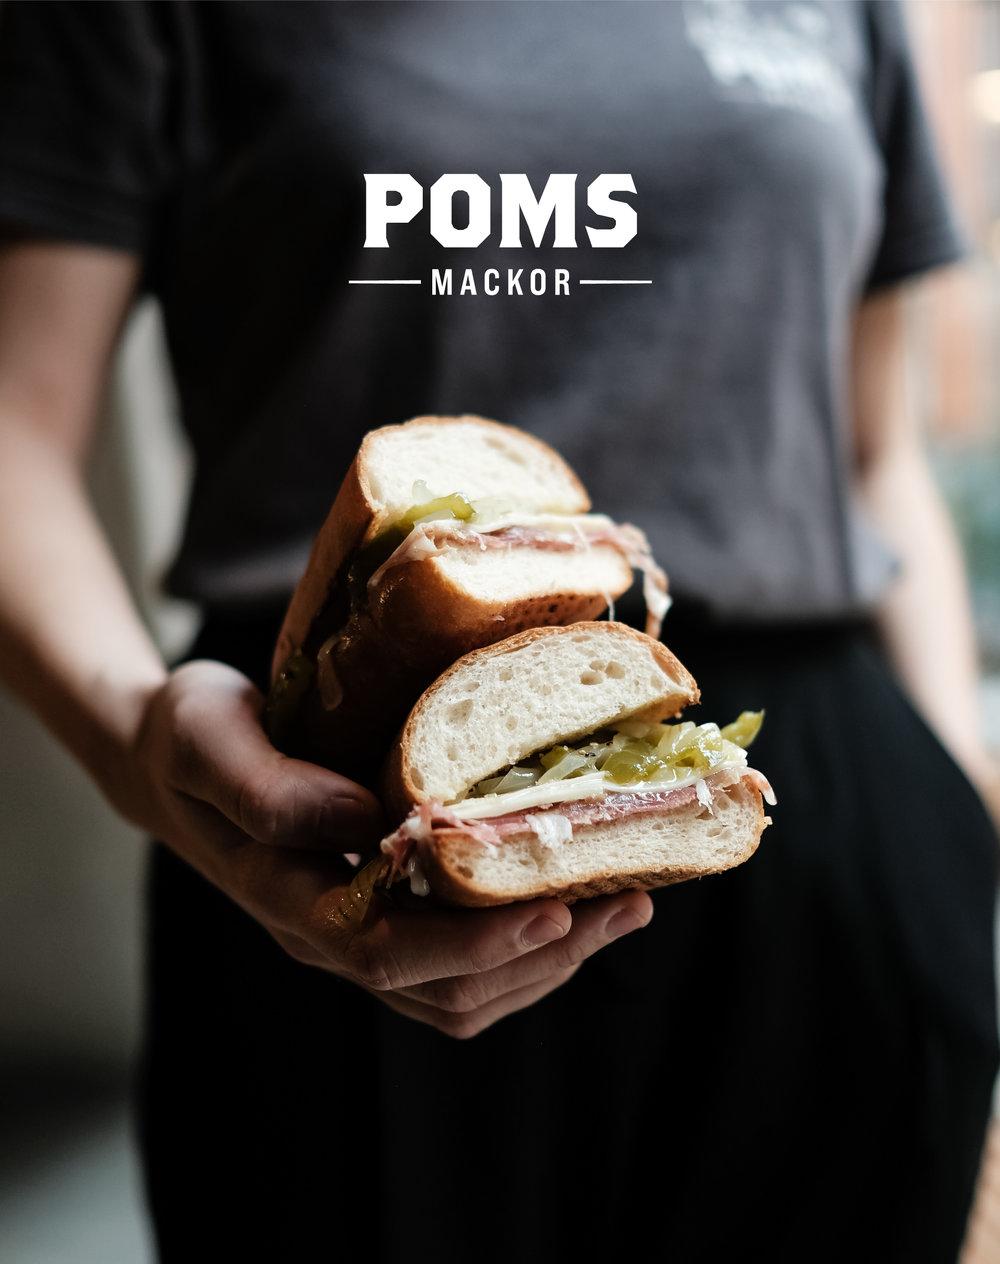 poms-mackor_sandwich_identity-title.jpg